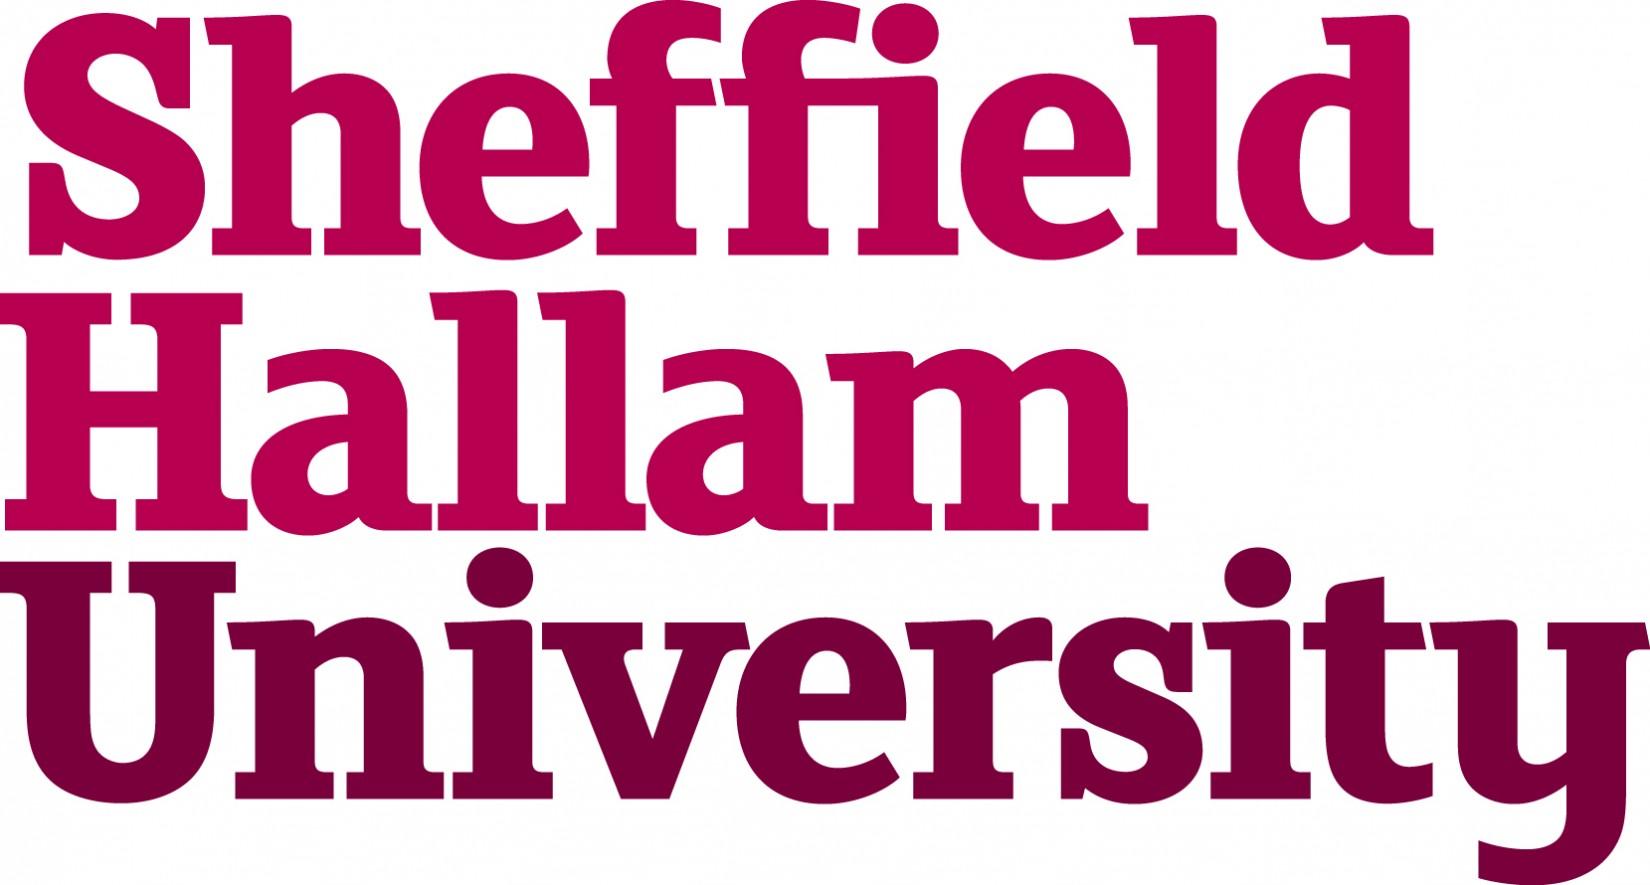 Sheffield Hallam University Logo Font - forum | dafont.com